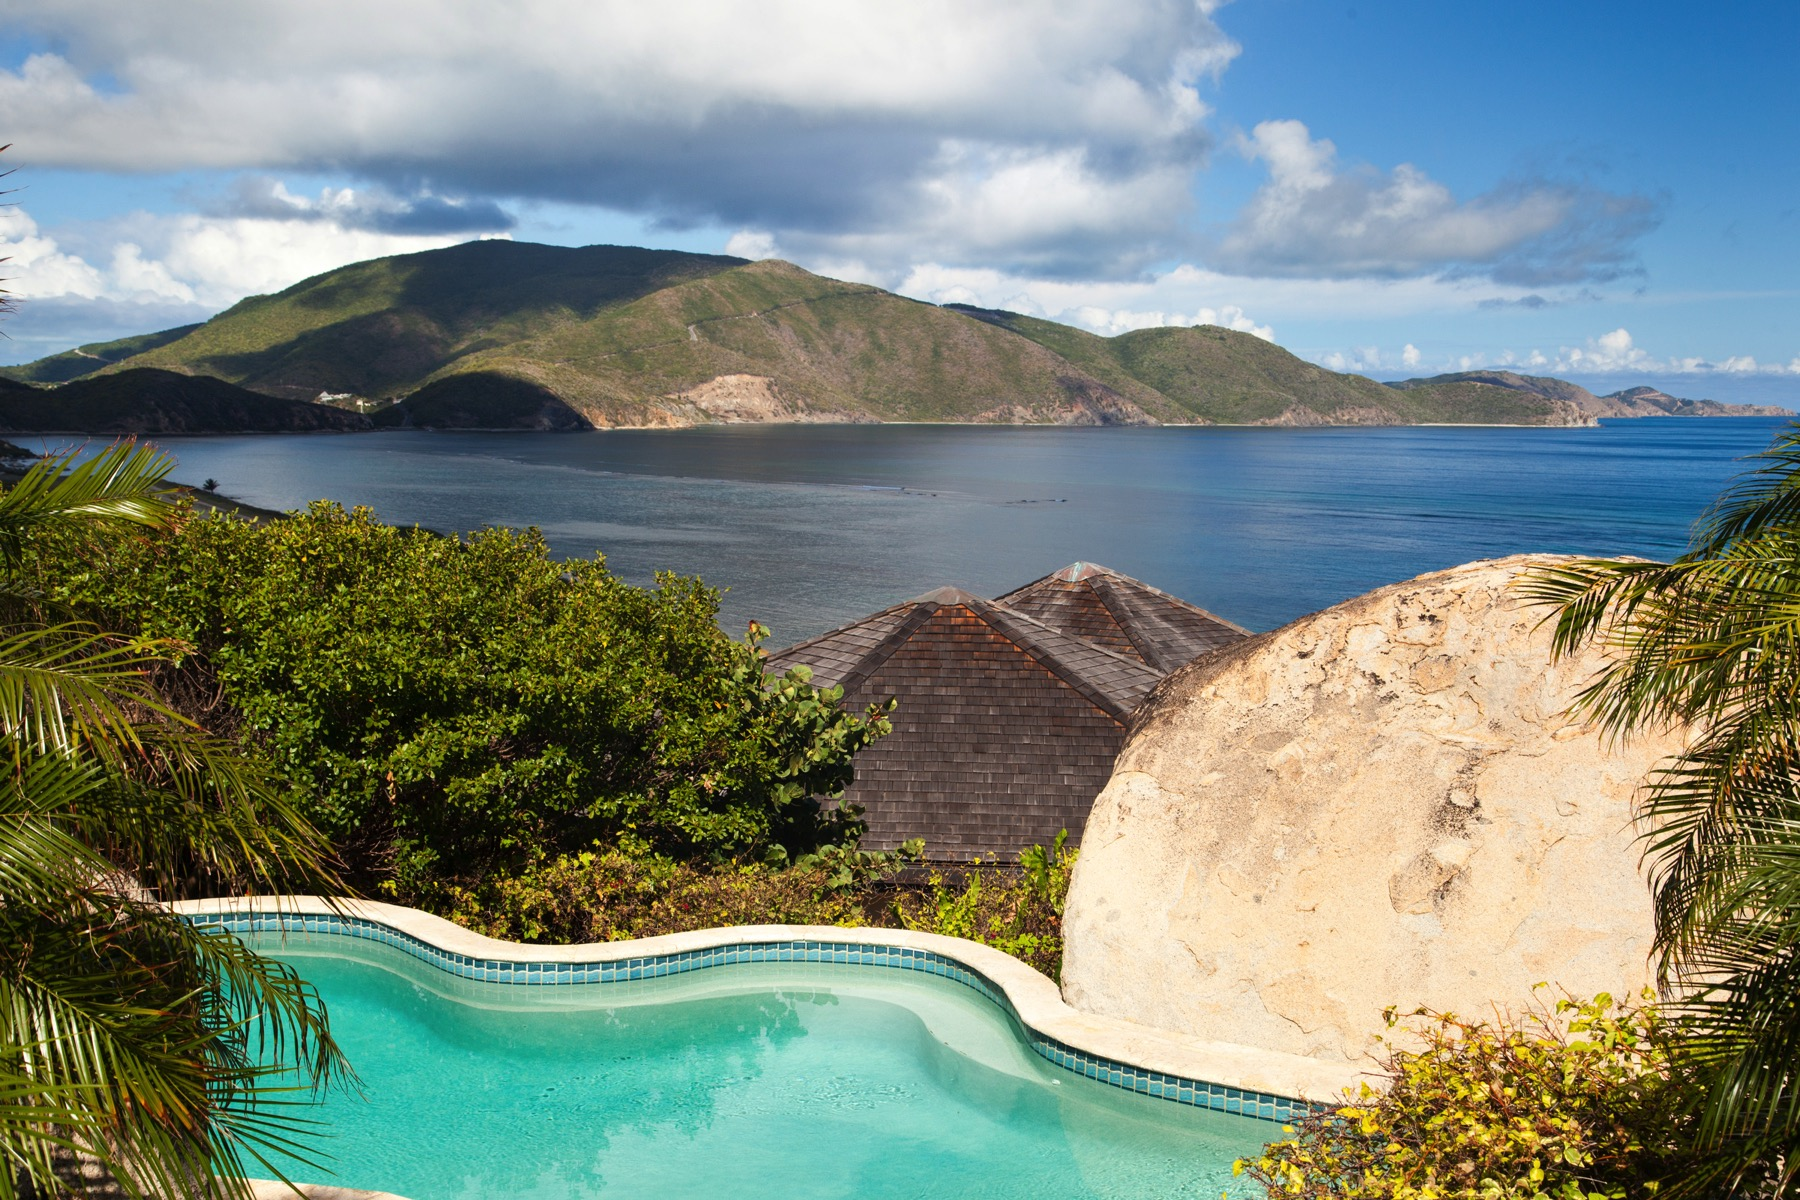 Single Family Home for Sale at Windy Hill Villa Windy Hill, Virgin Gorda British Virgin Islands